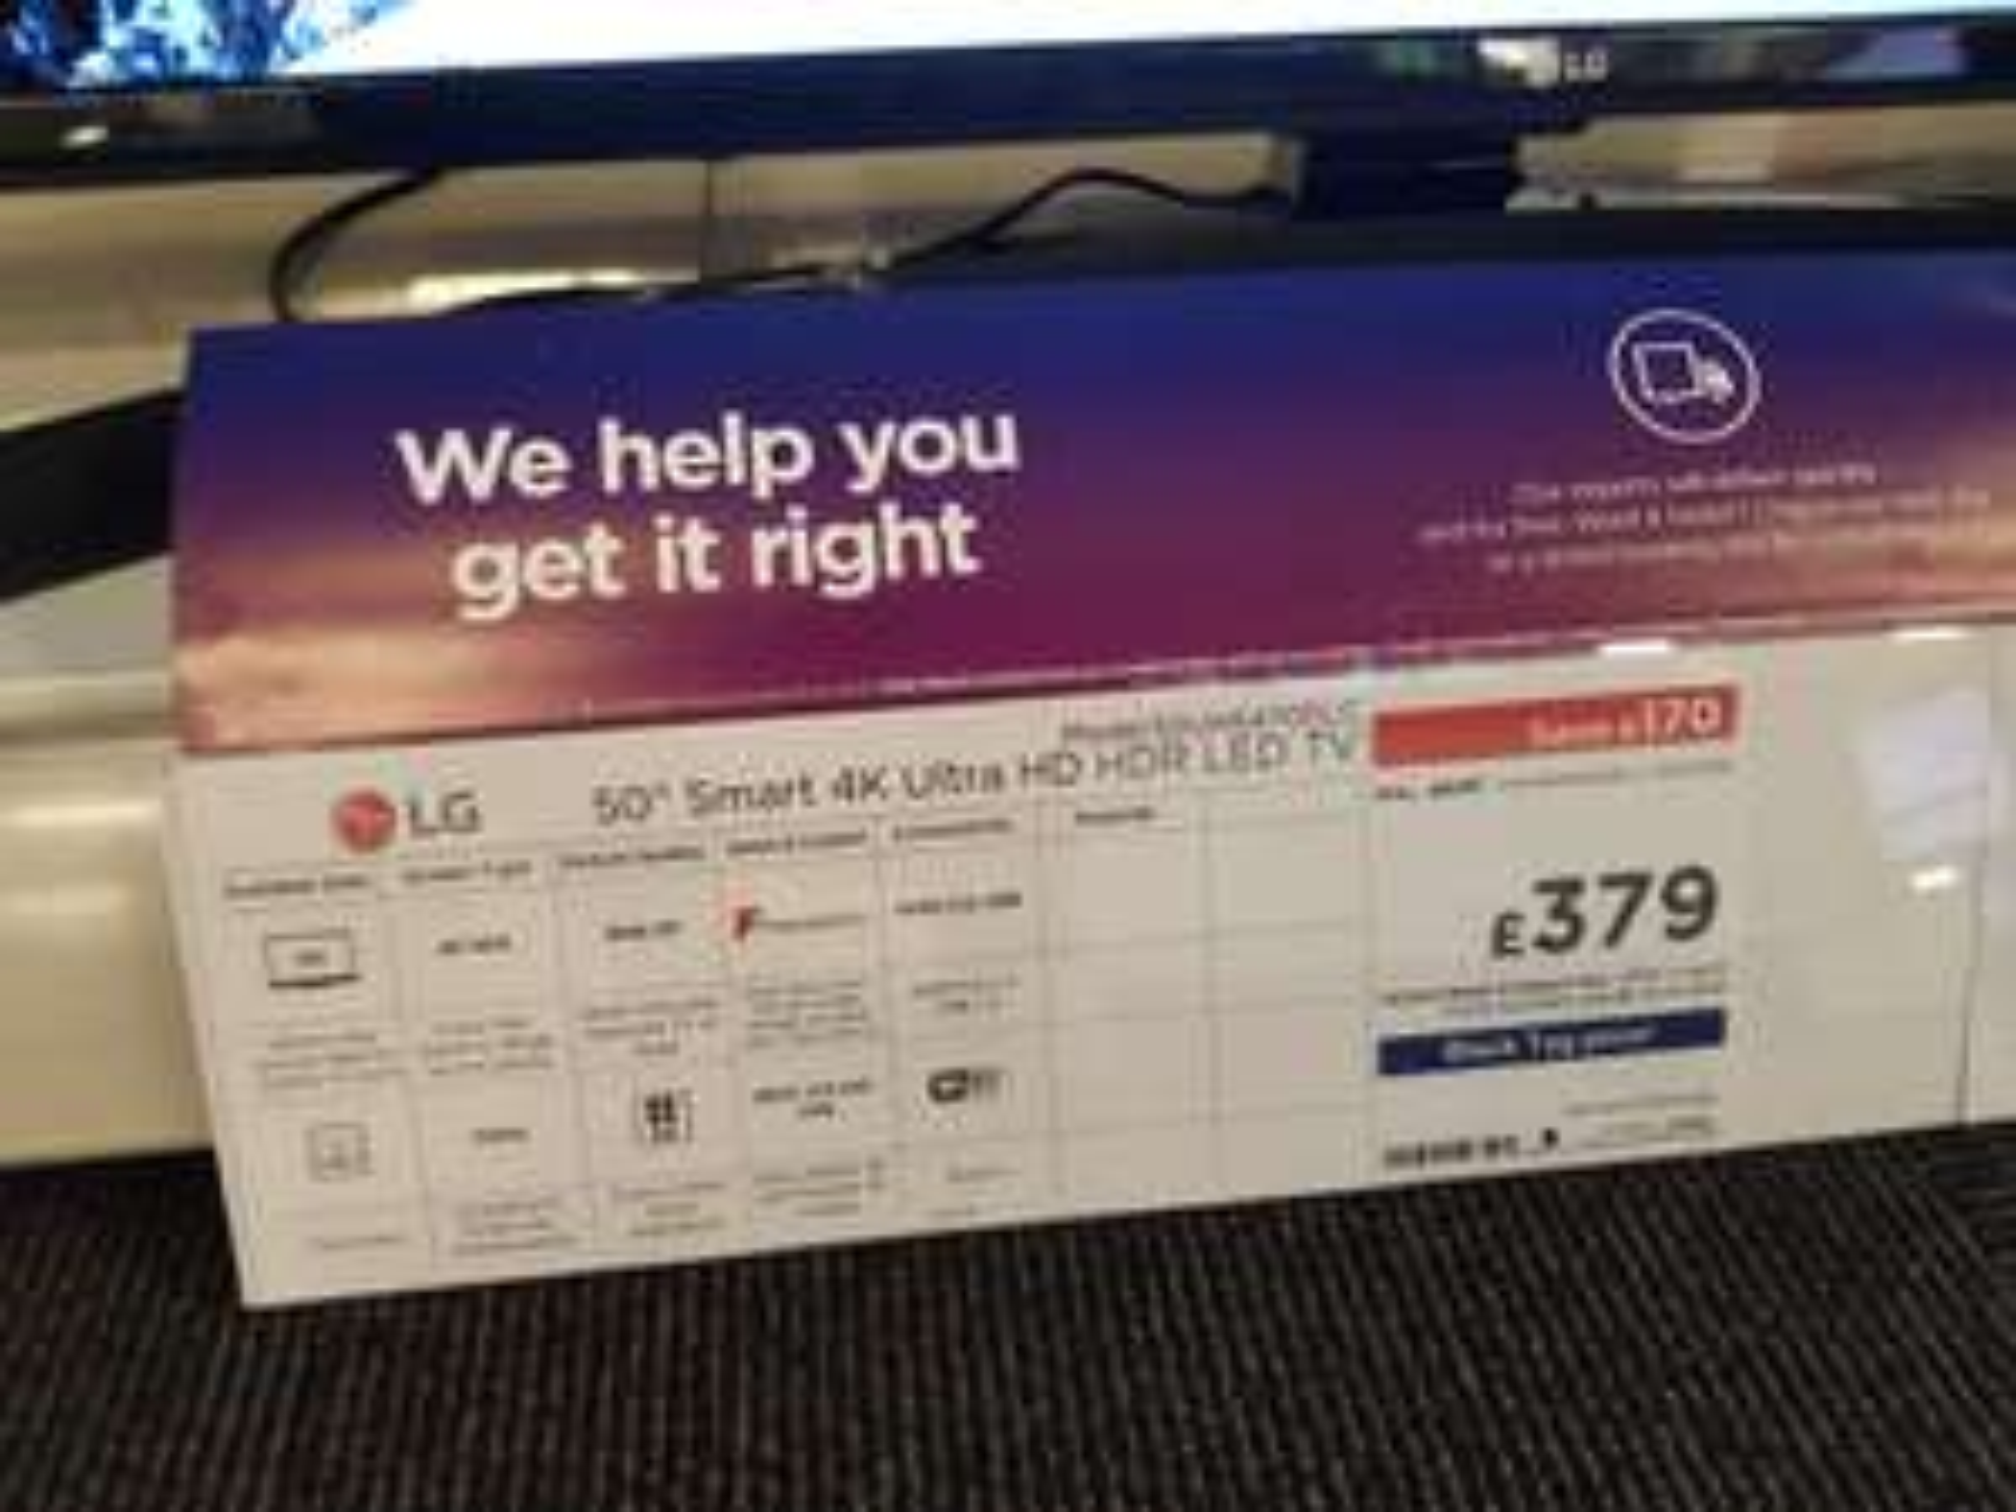 "LG 50UK6470PLC 50"" Smart 4K Ultra HD HDR LED TV £379 - edit now online using code TRANSFER20 @ Currys"